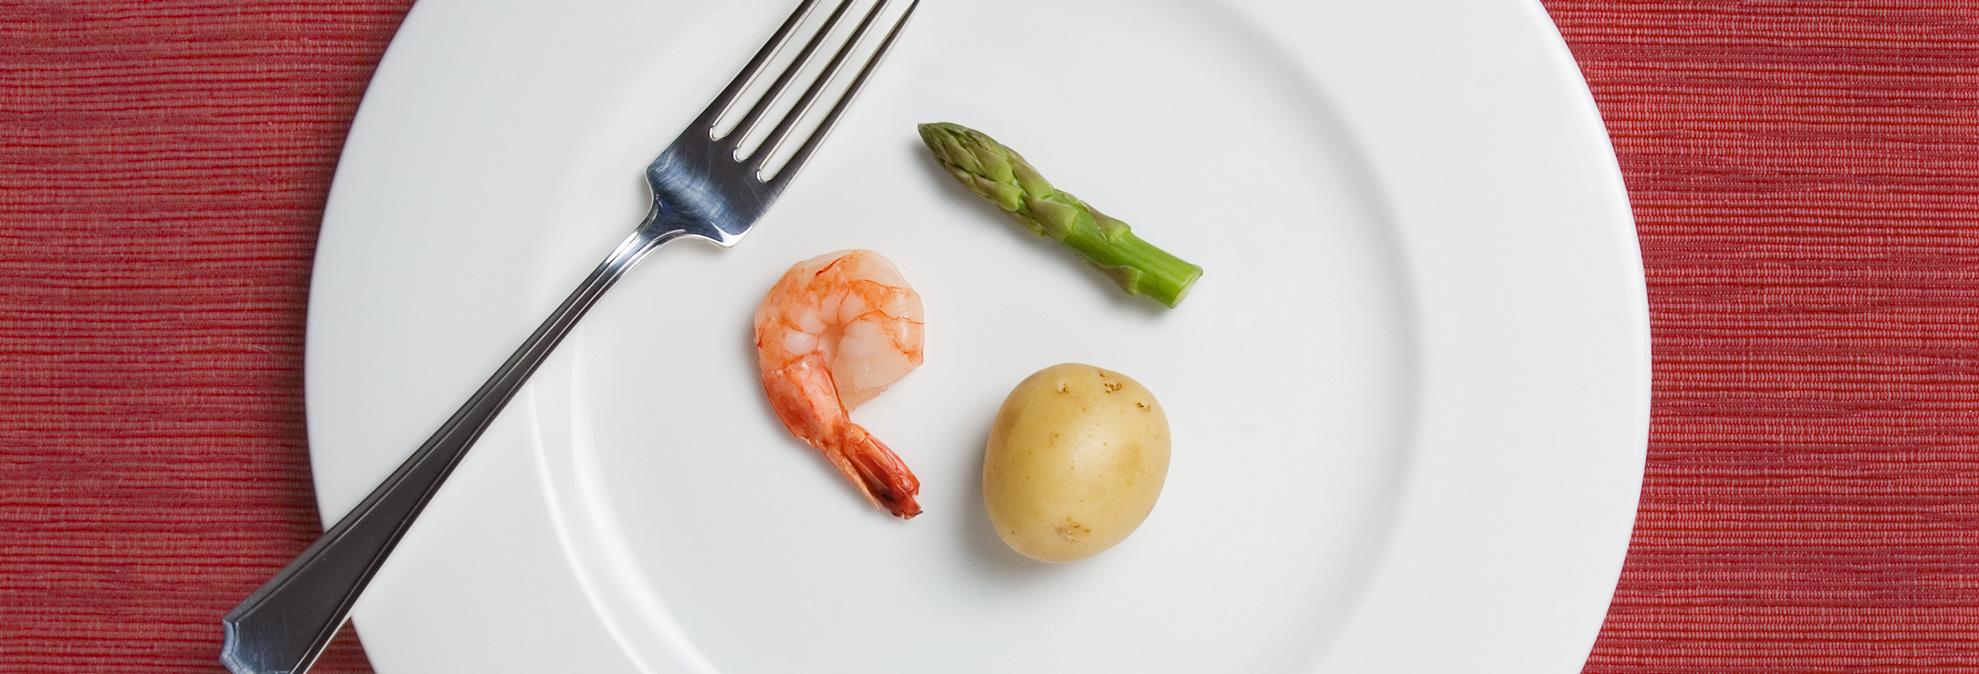 Fat loss diet bodybuilding.com